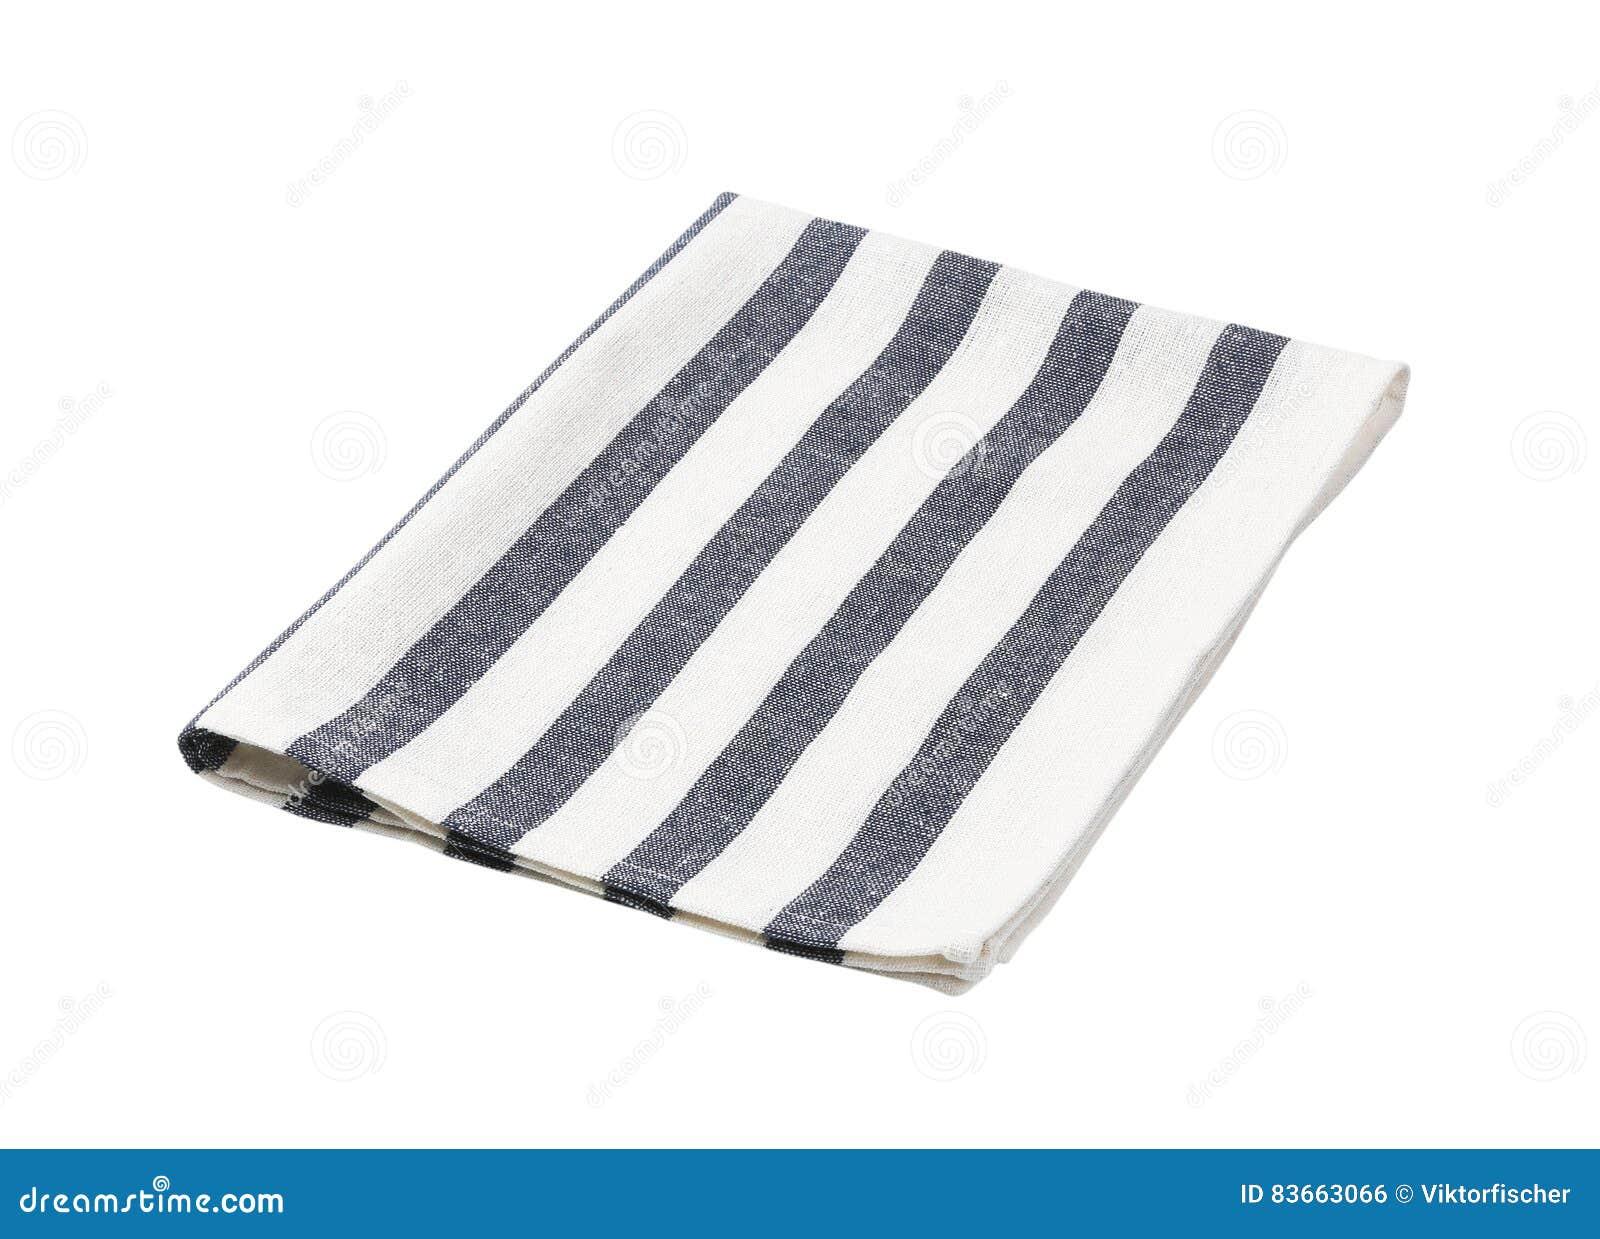 6574c12f0221 Striped dish towel stock photo. Image of striped